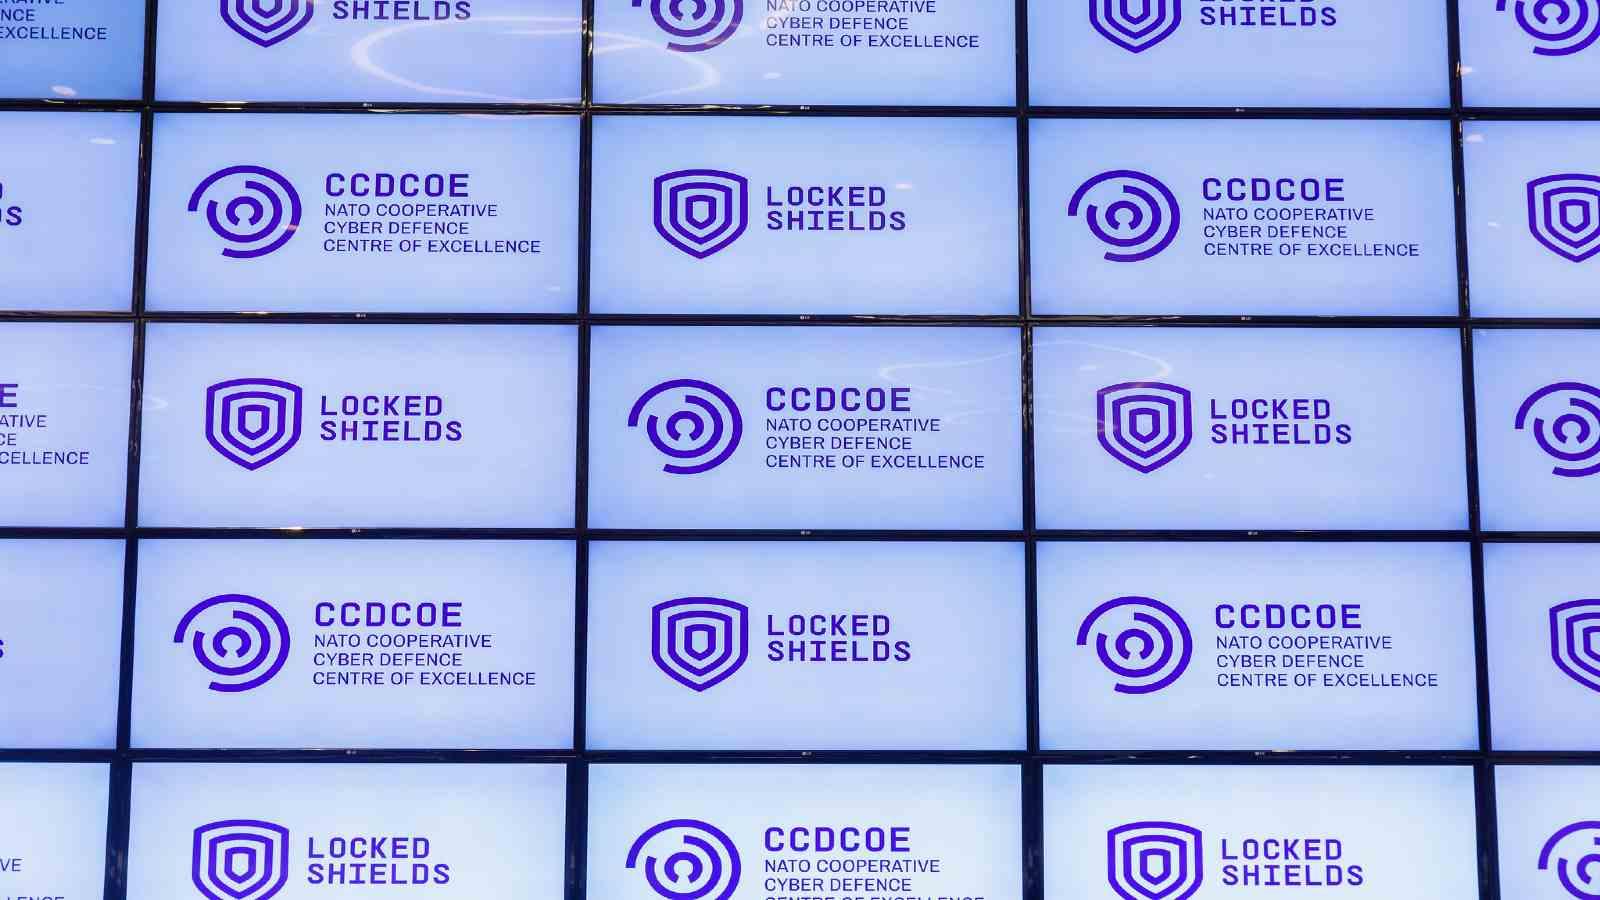 NATO CCDCOE Locked Shields, April 8, 2019